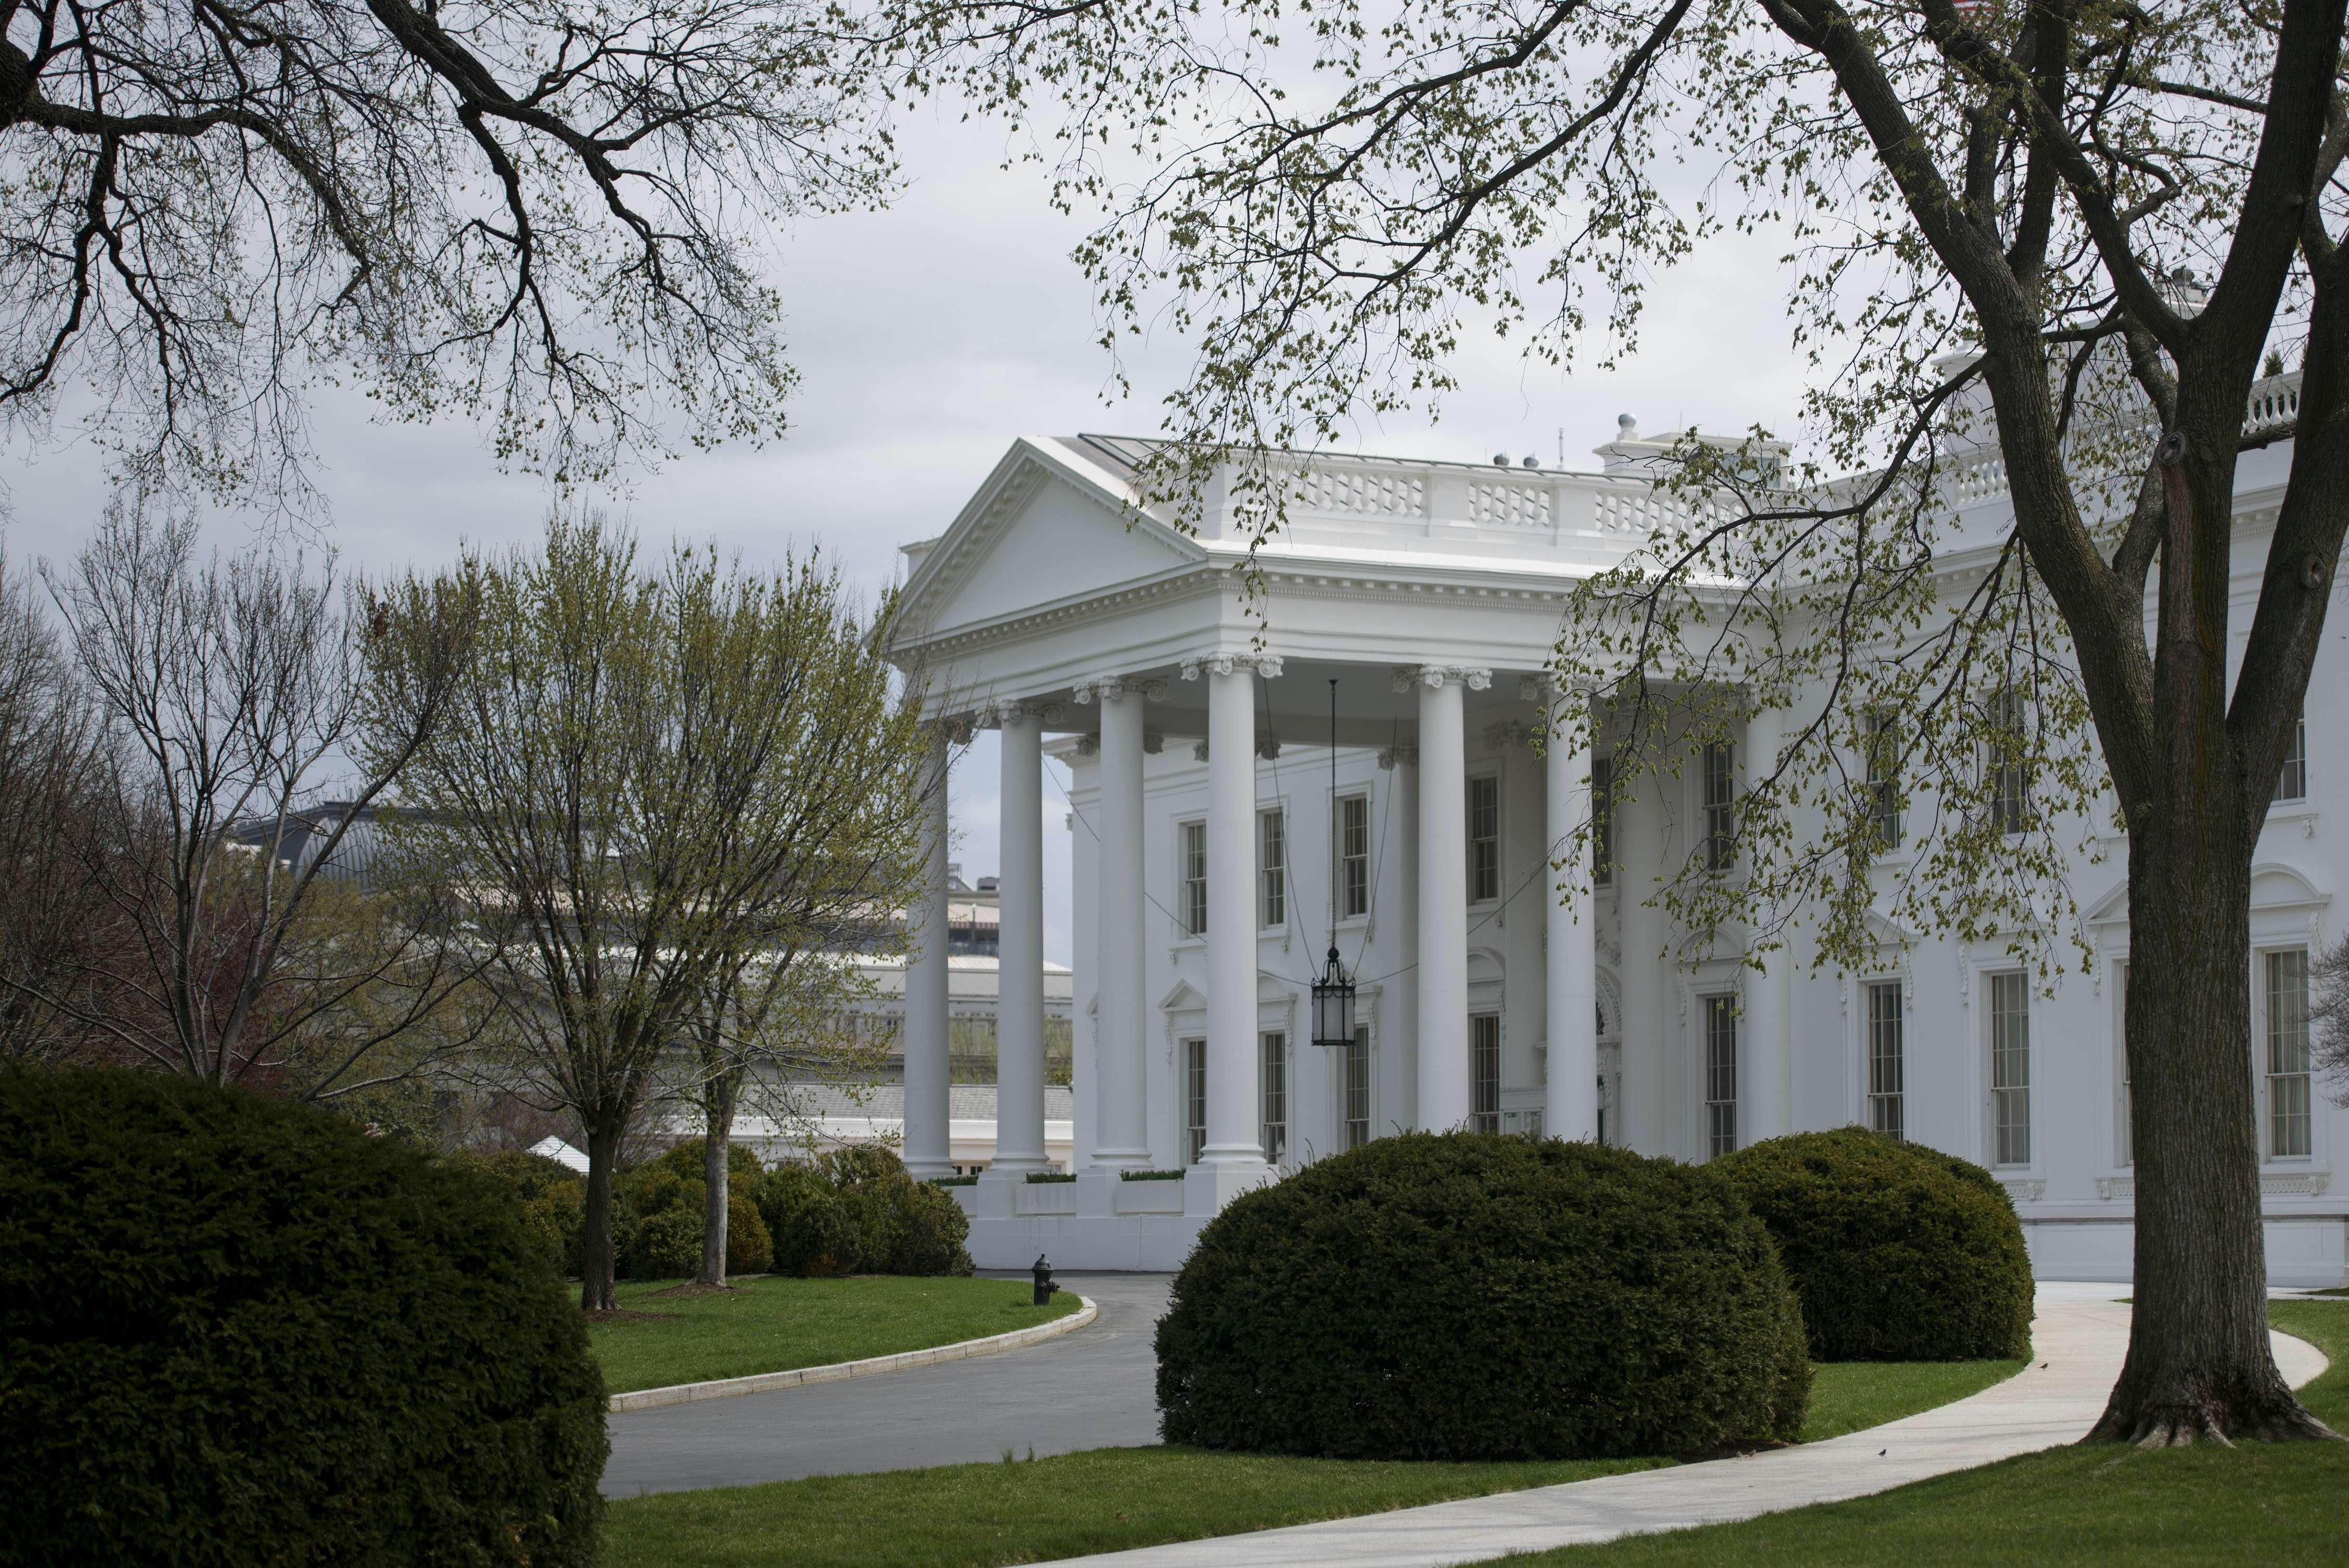 The White House seen on April 7, 2015 in Washington.